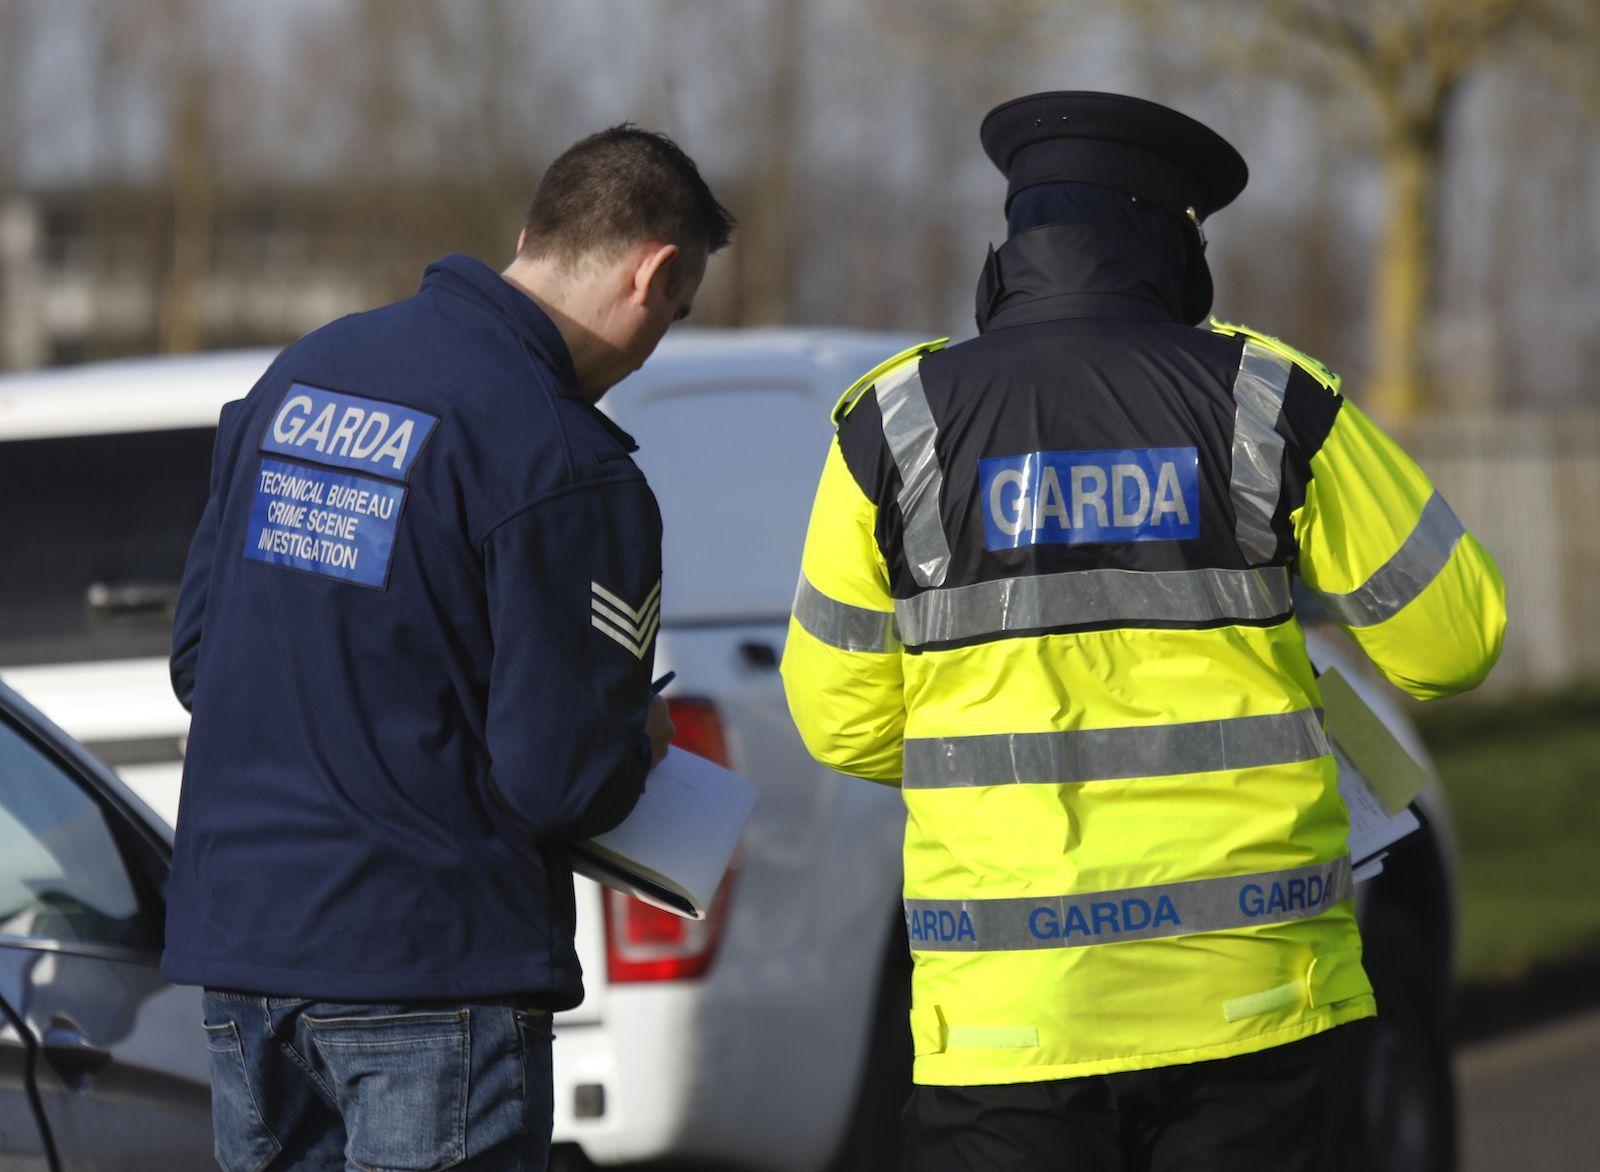 Police investigation underway in New Haven   fox61.com